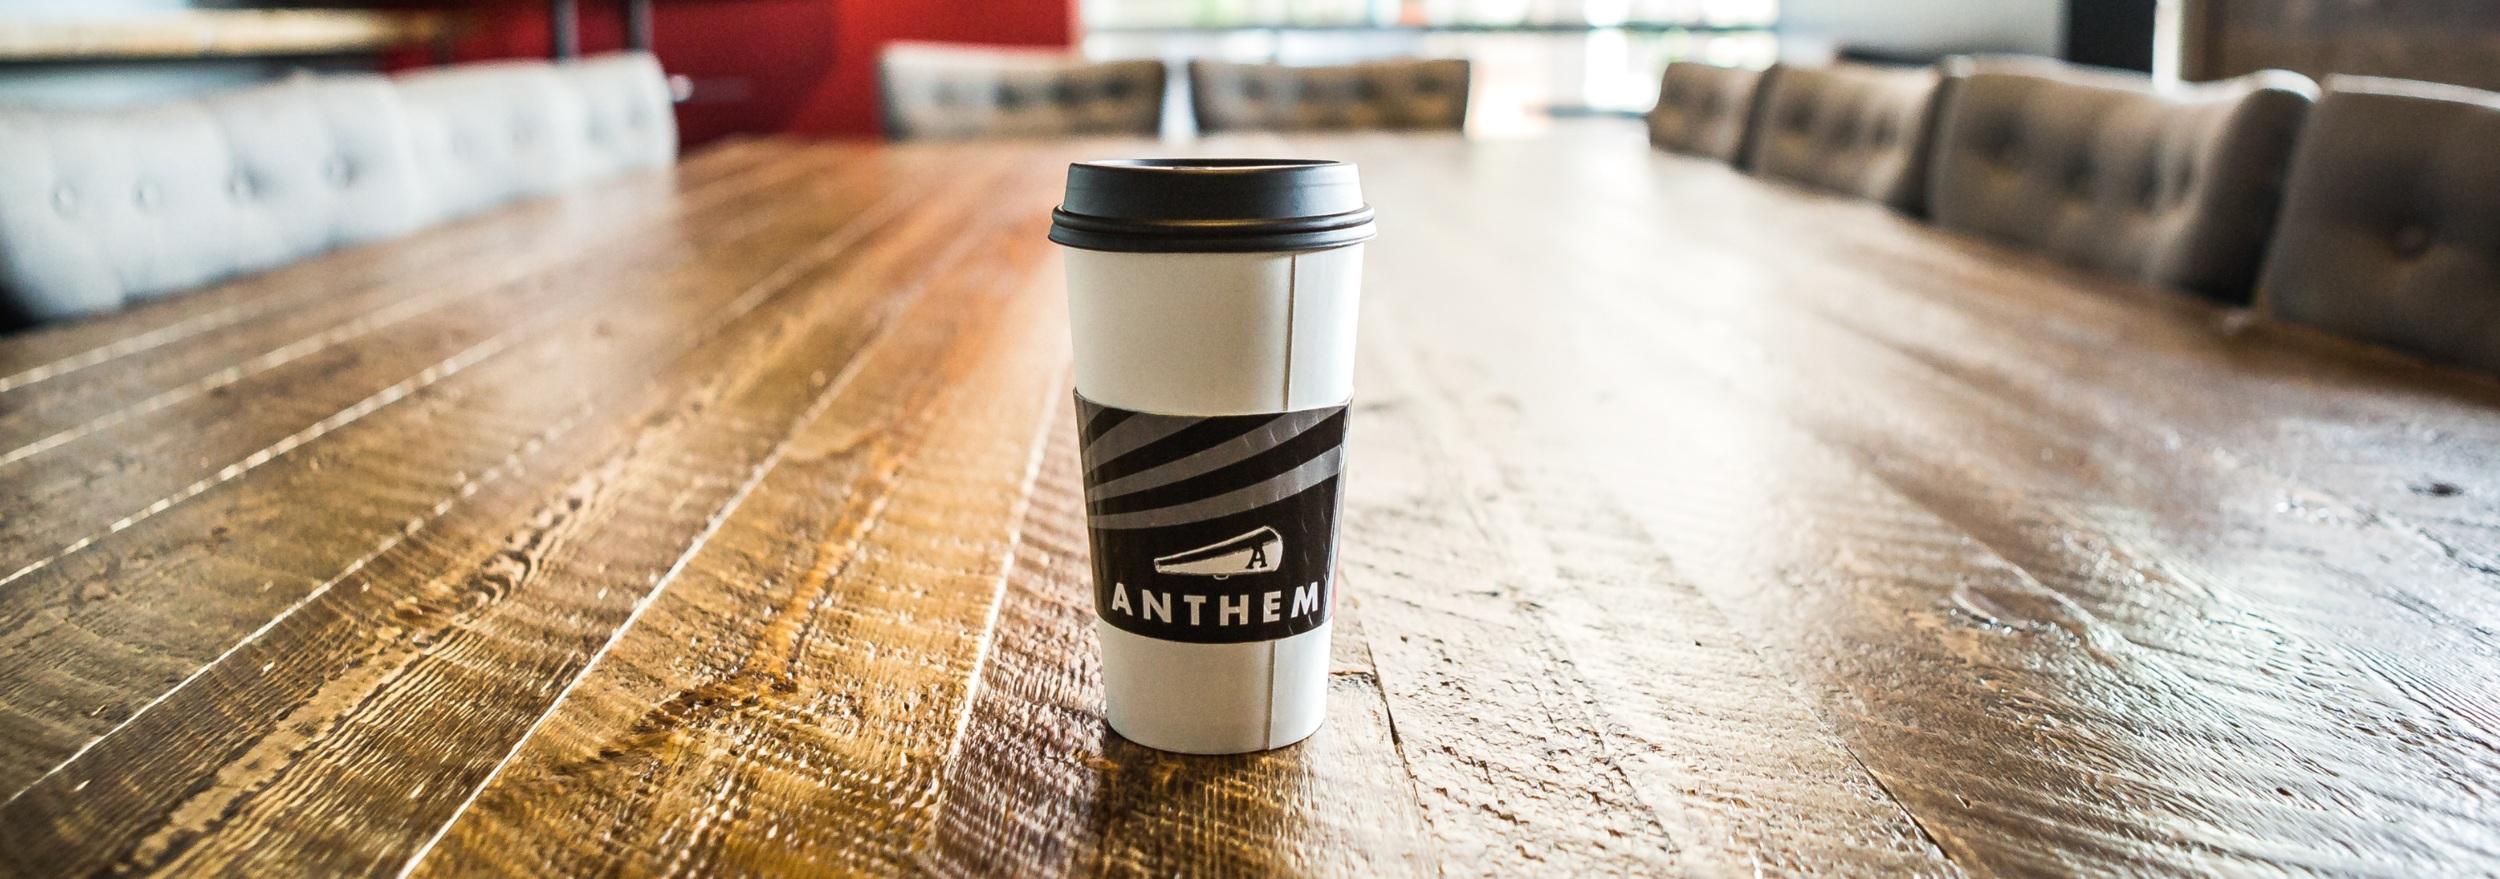 COFFEE SCHOOL | — ANTHEM